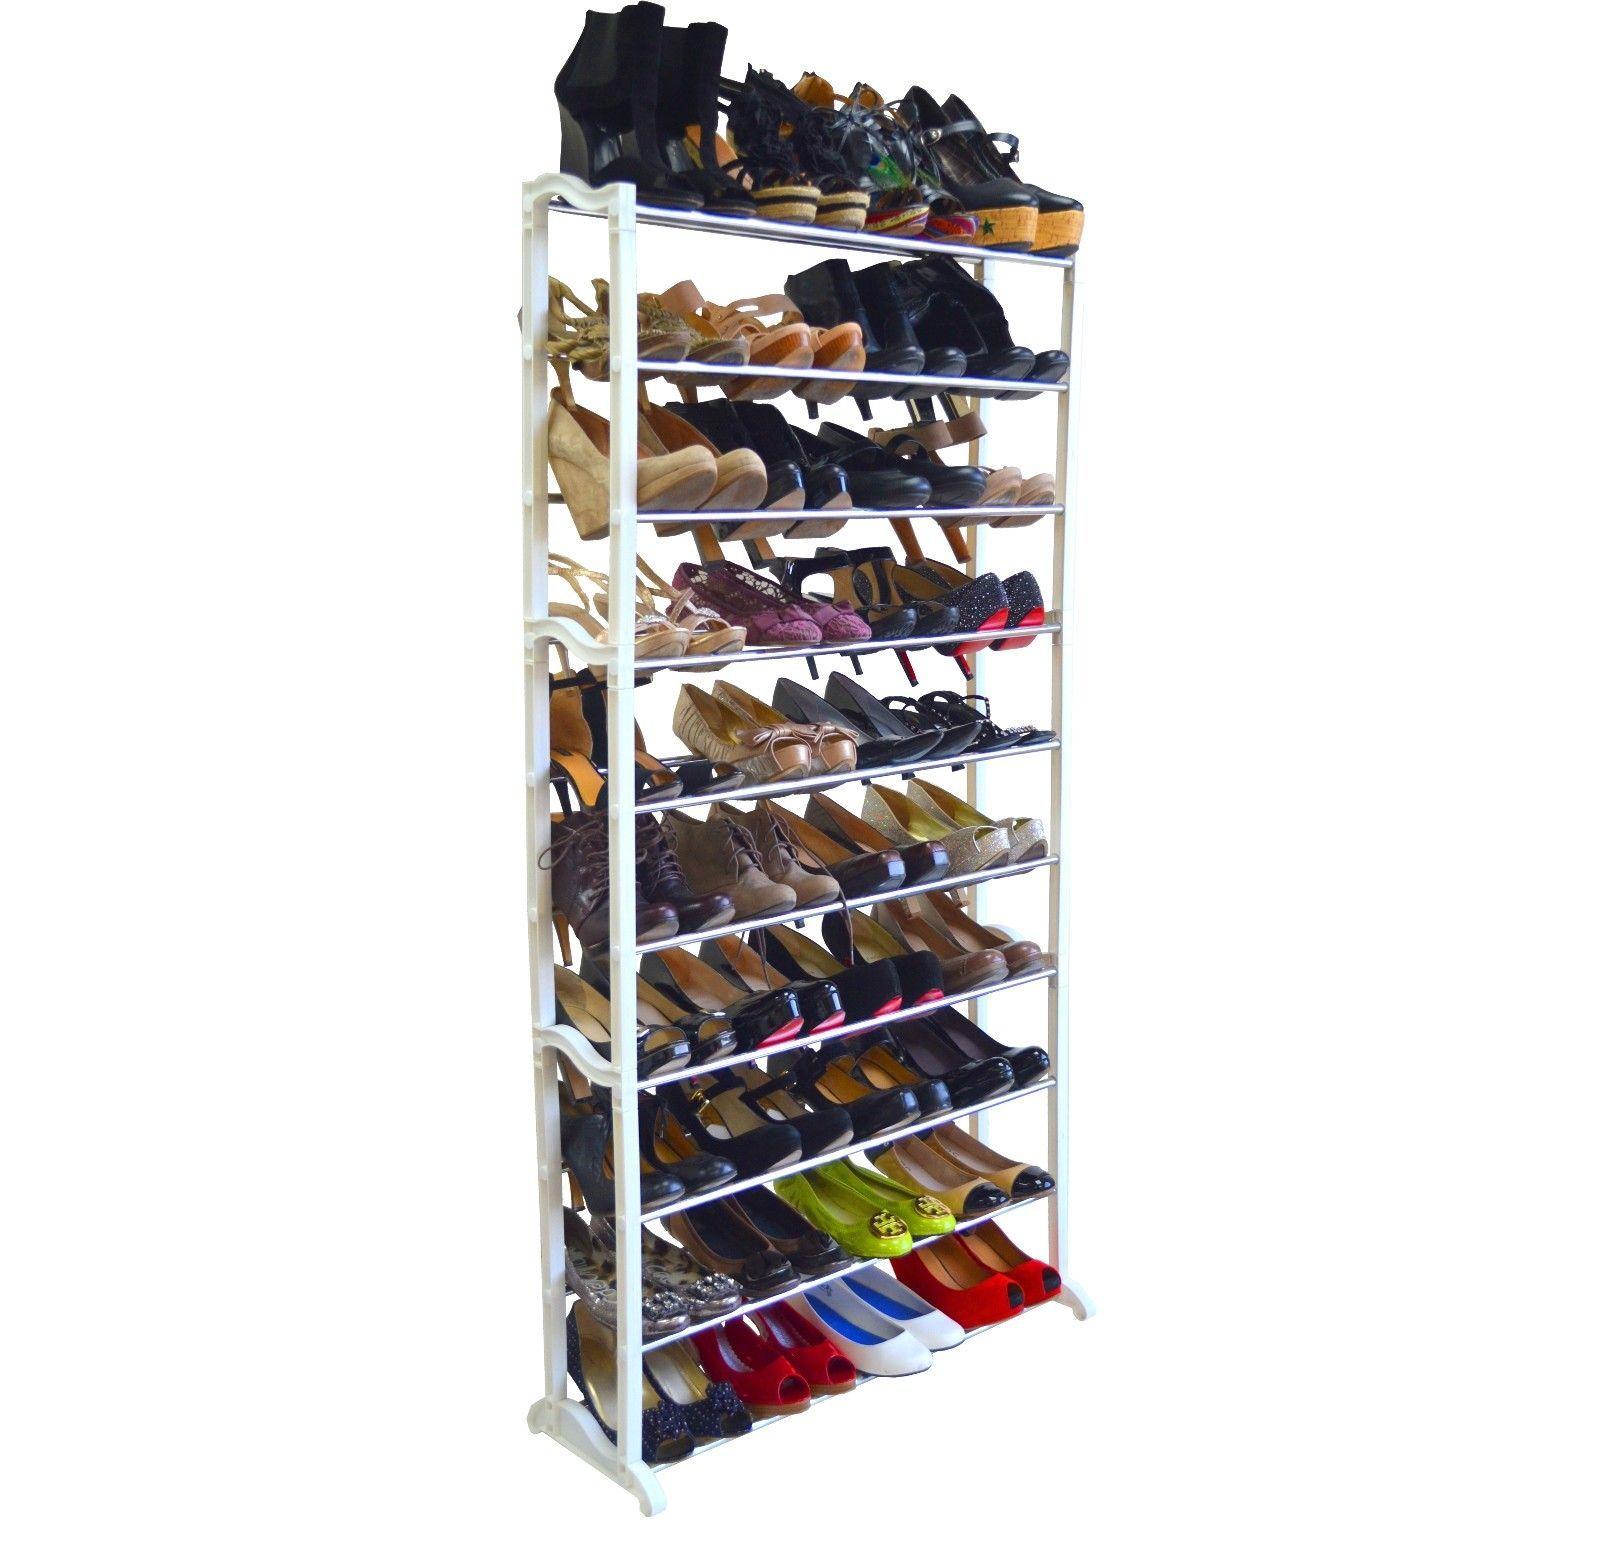 Linen Depot Direct 40 Pair Shoe Rack Shoe Rack 50 Pair Shoe